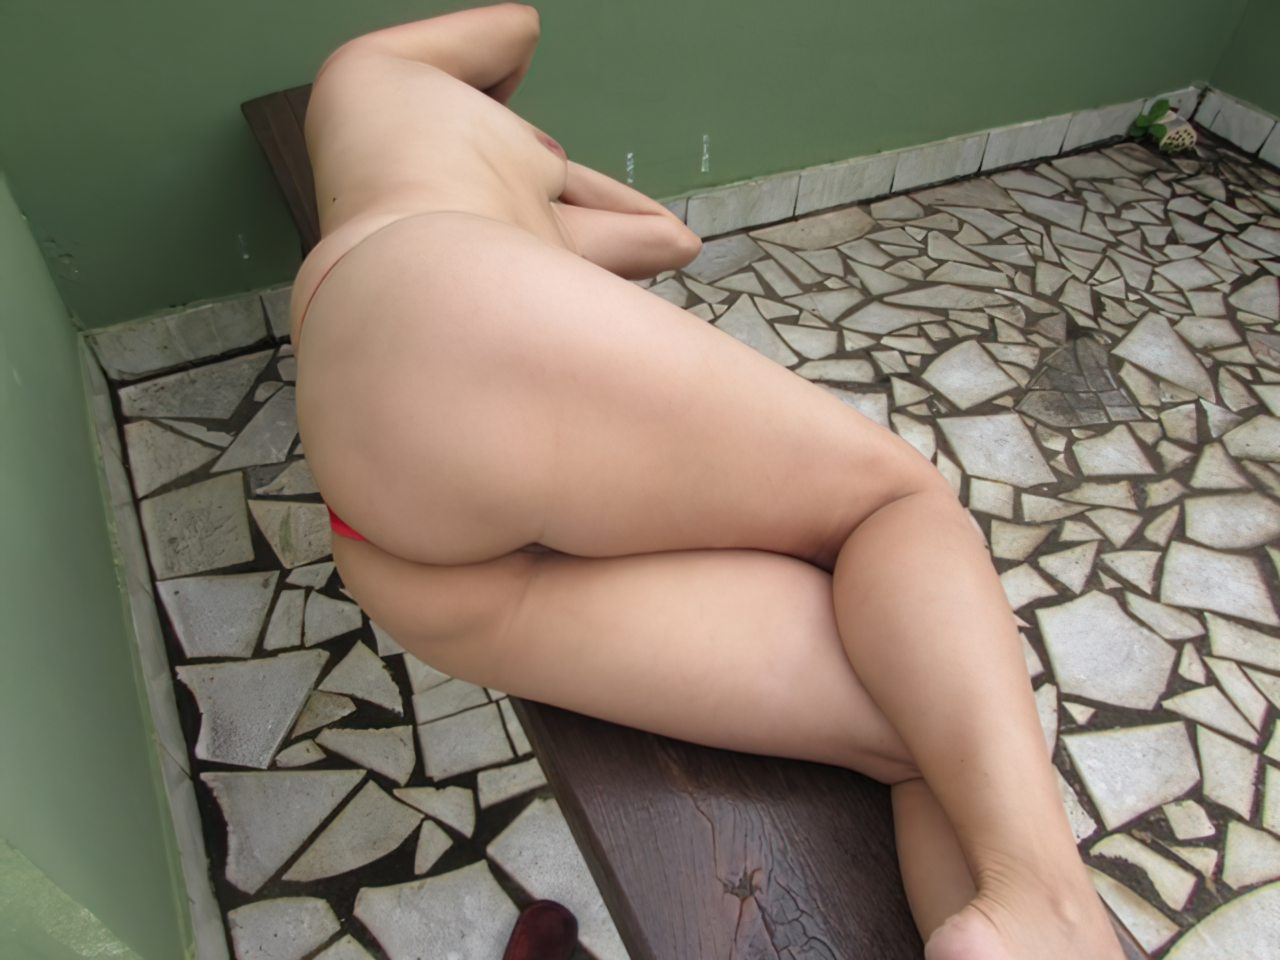 Calcinha Entre a Buceta (11)